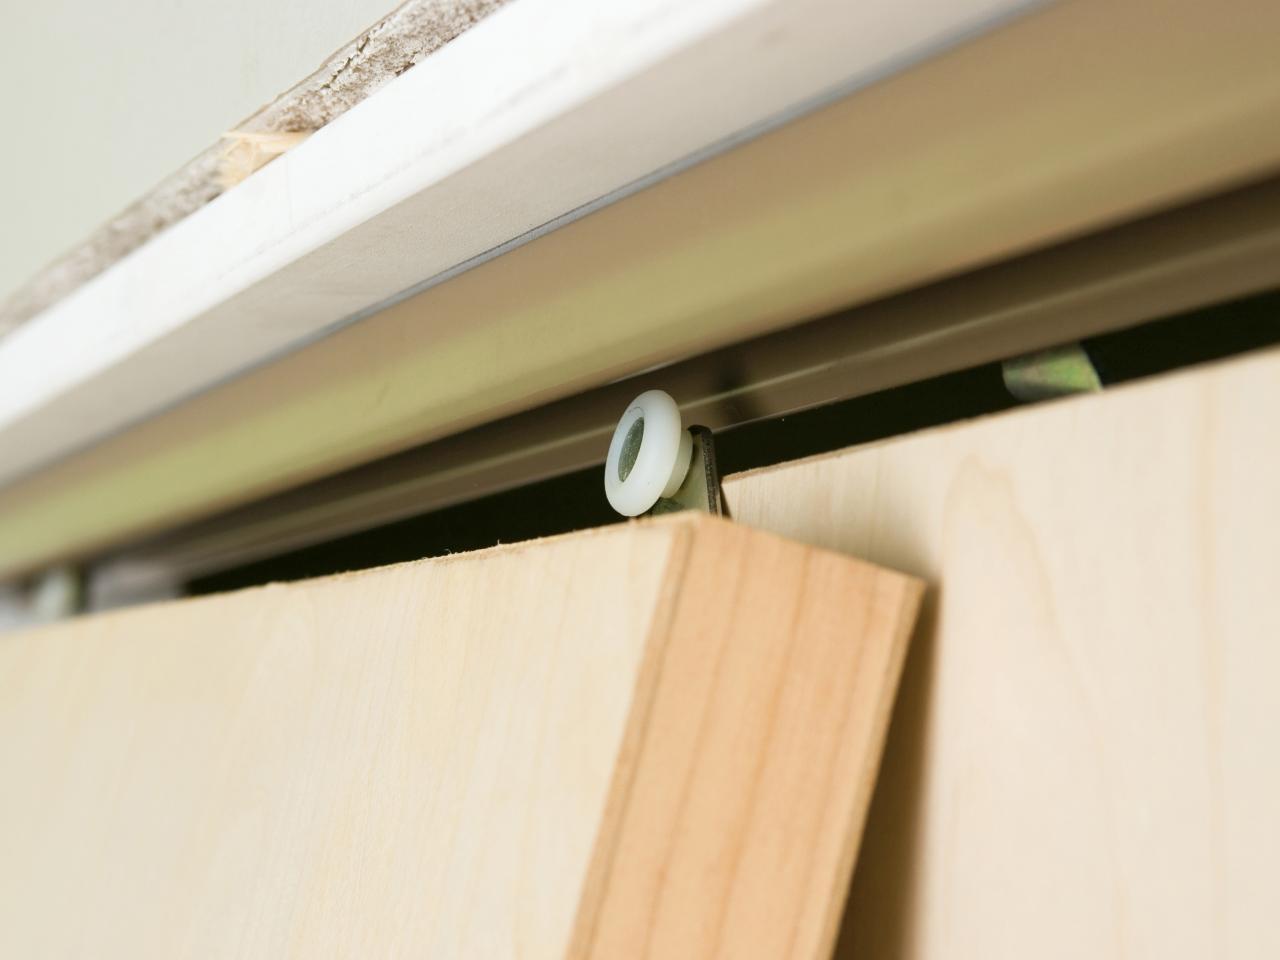 Hardware For Old Sliding Closet Doors1280 X 960